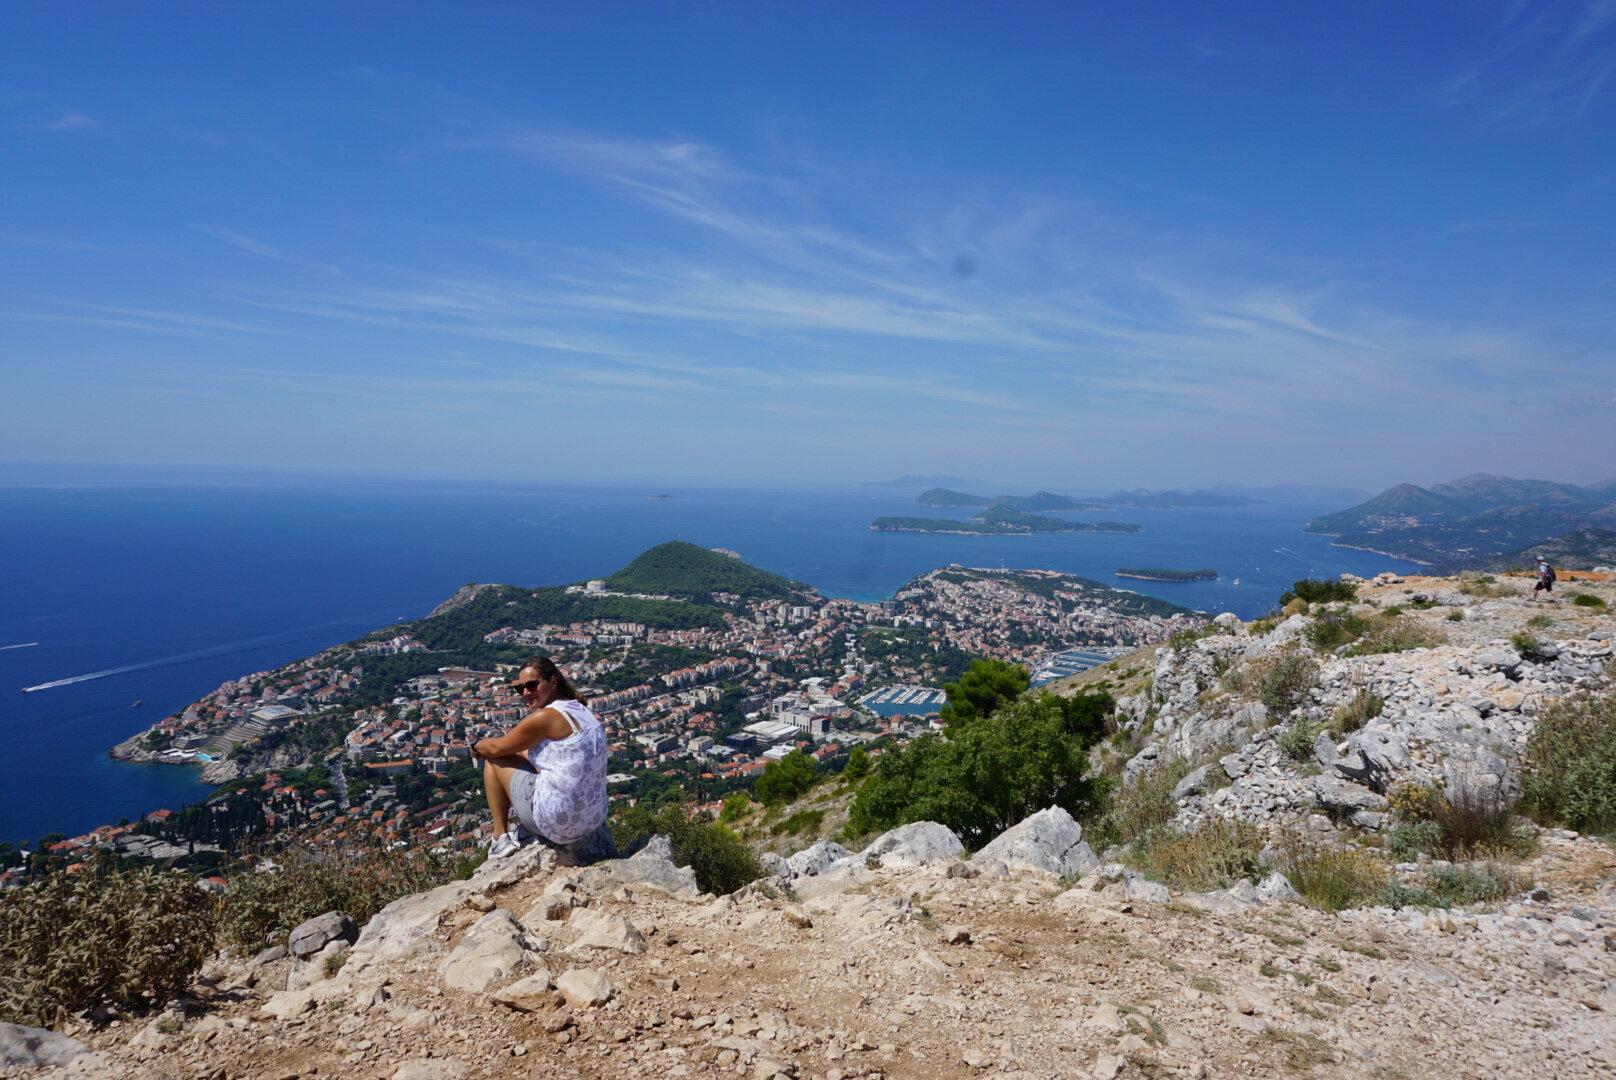 Mt Srd, Dubrovnik, Croatia